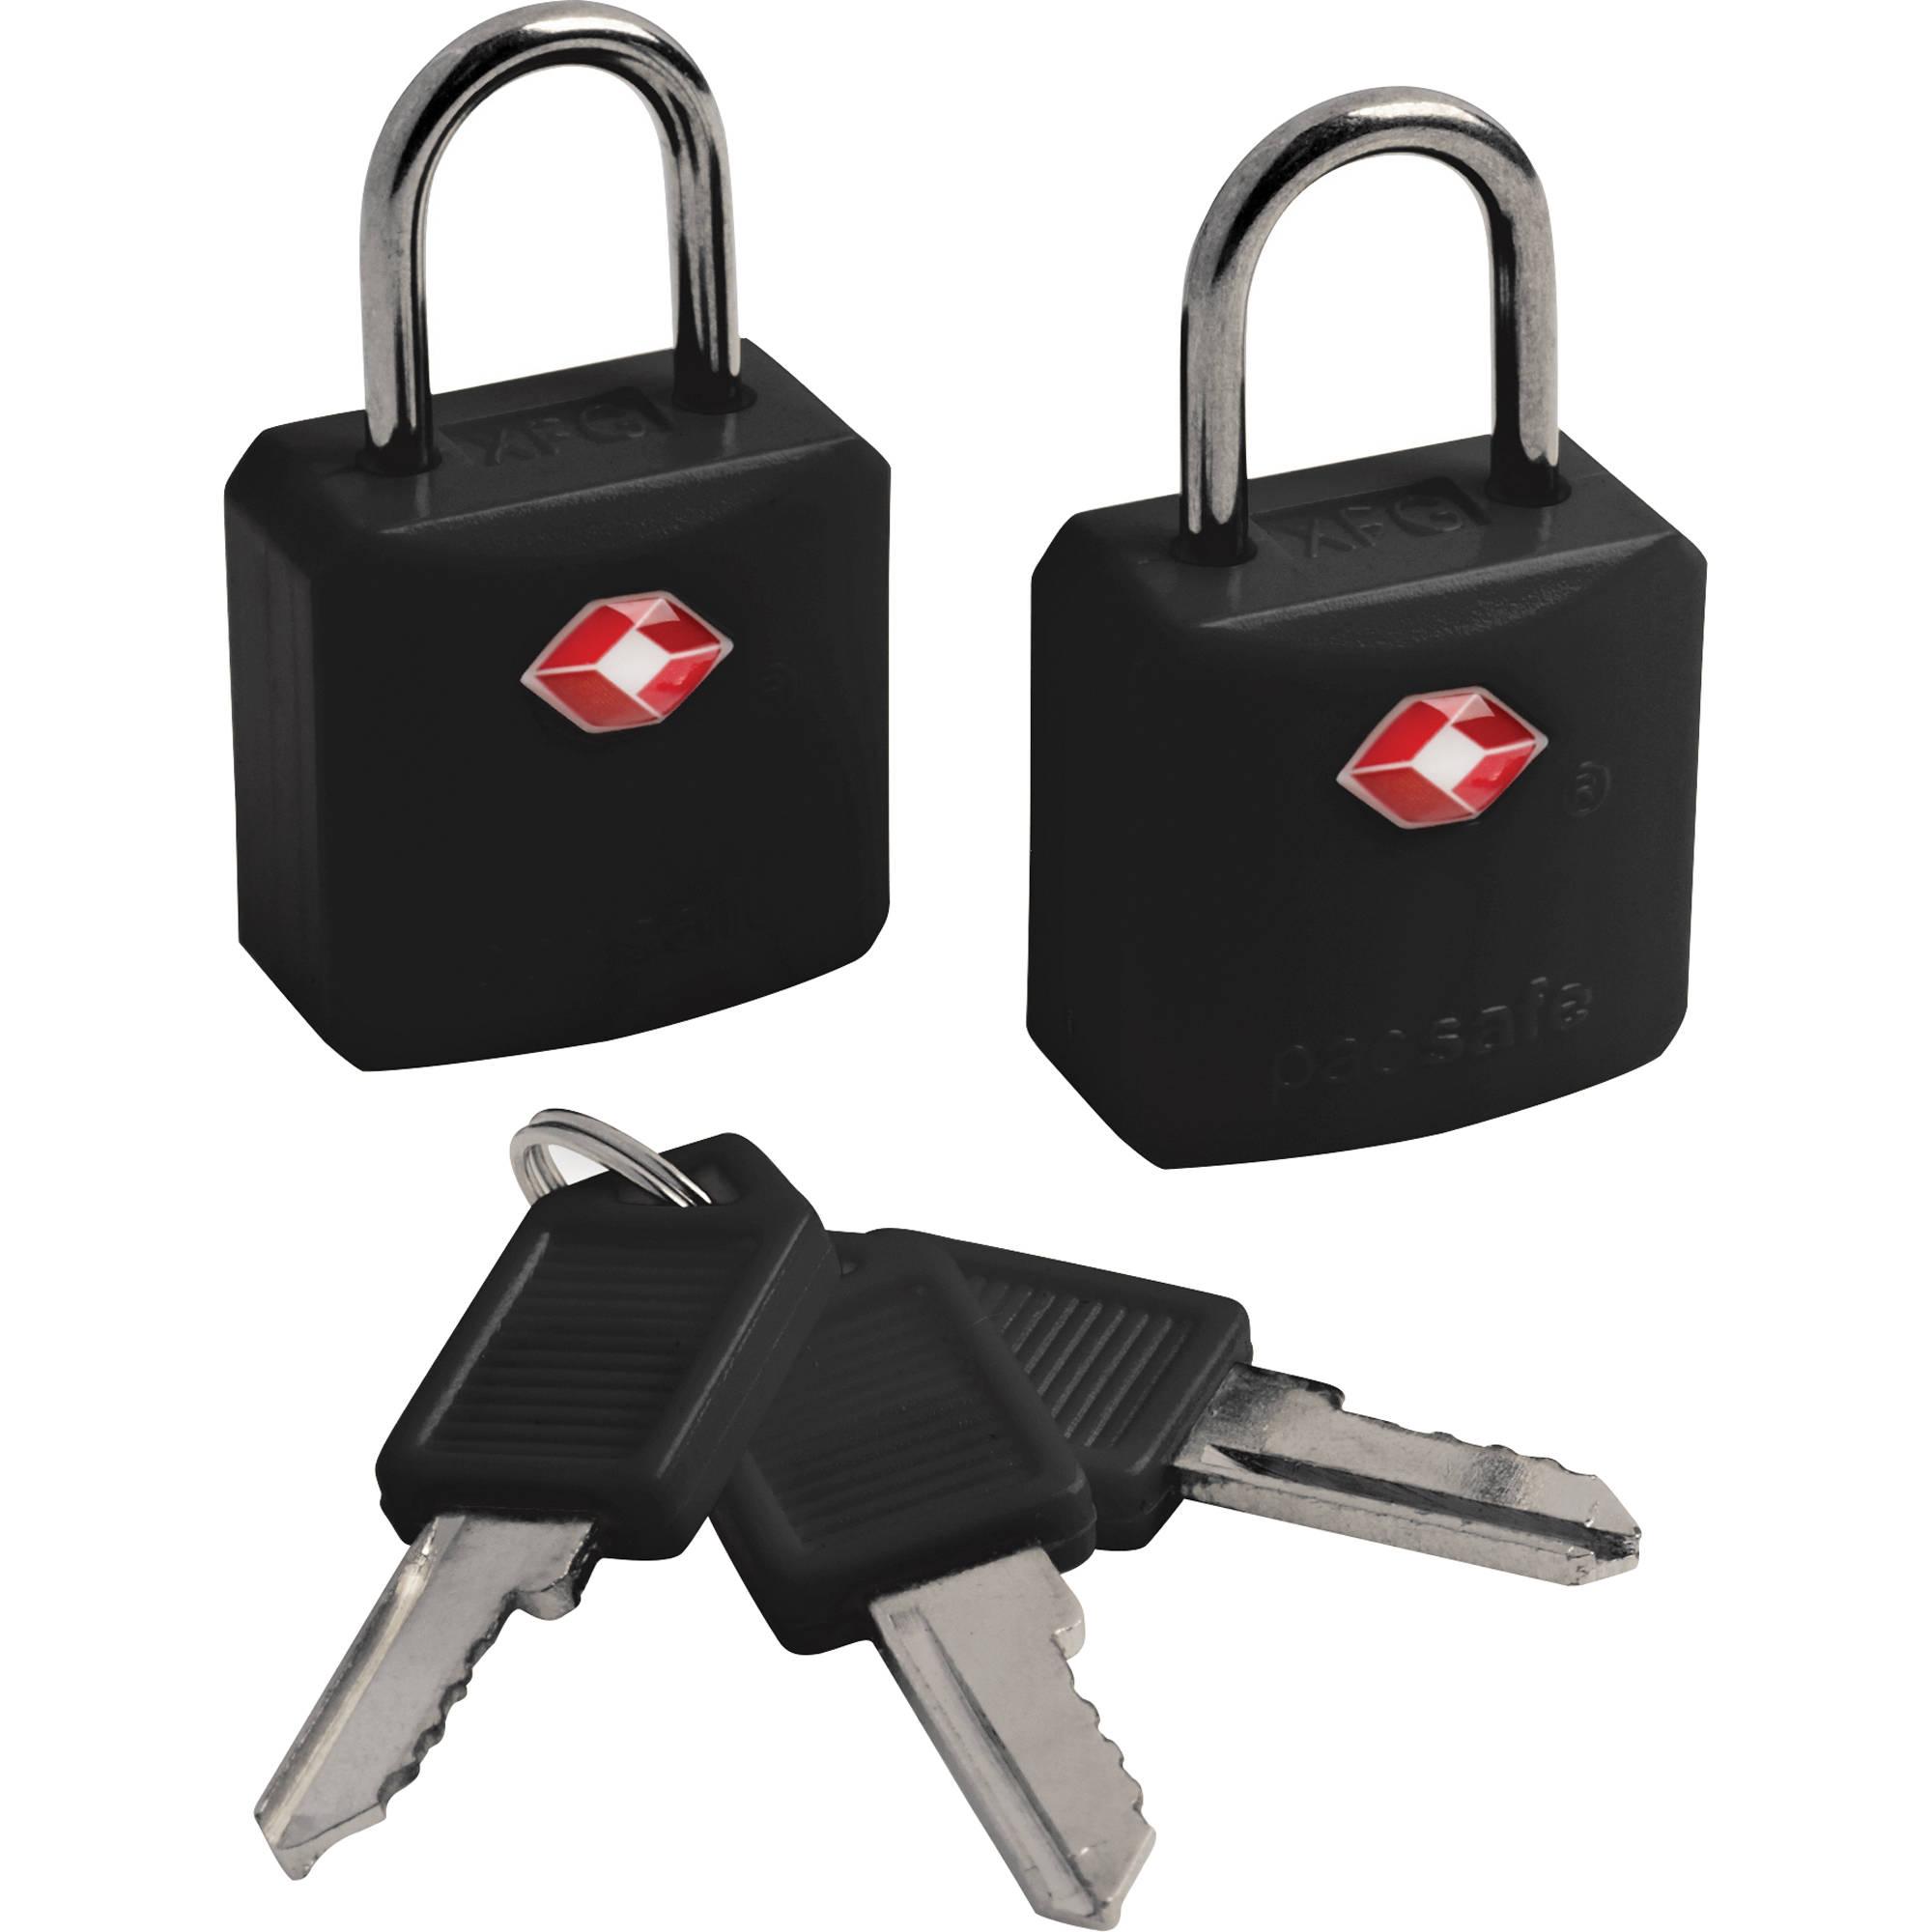 5132fe5cf519 Pacsafe Prosafe 620 TSA-Accepted Luggage Locks (Two, Black)